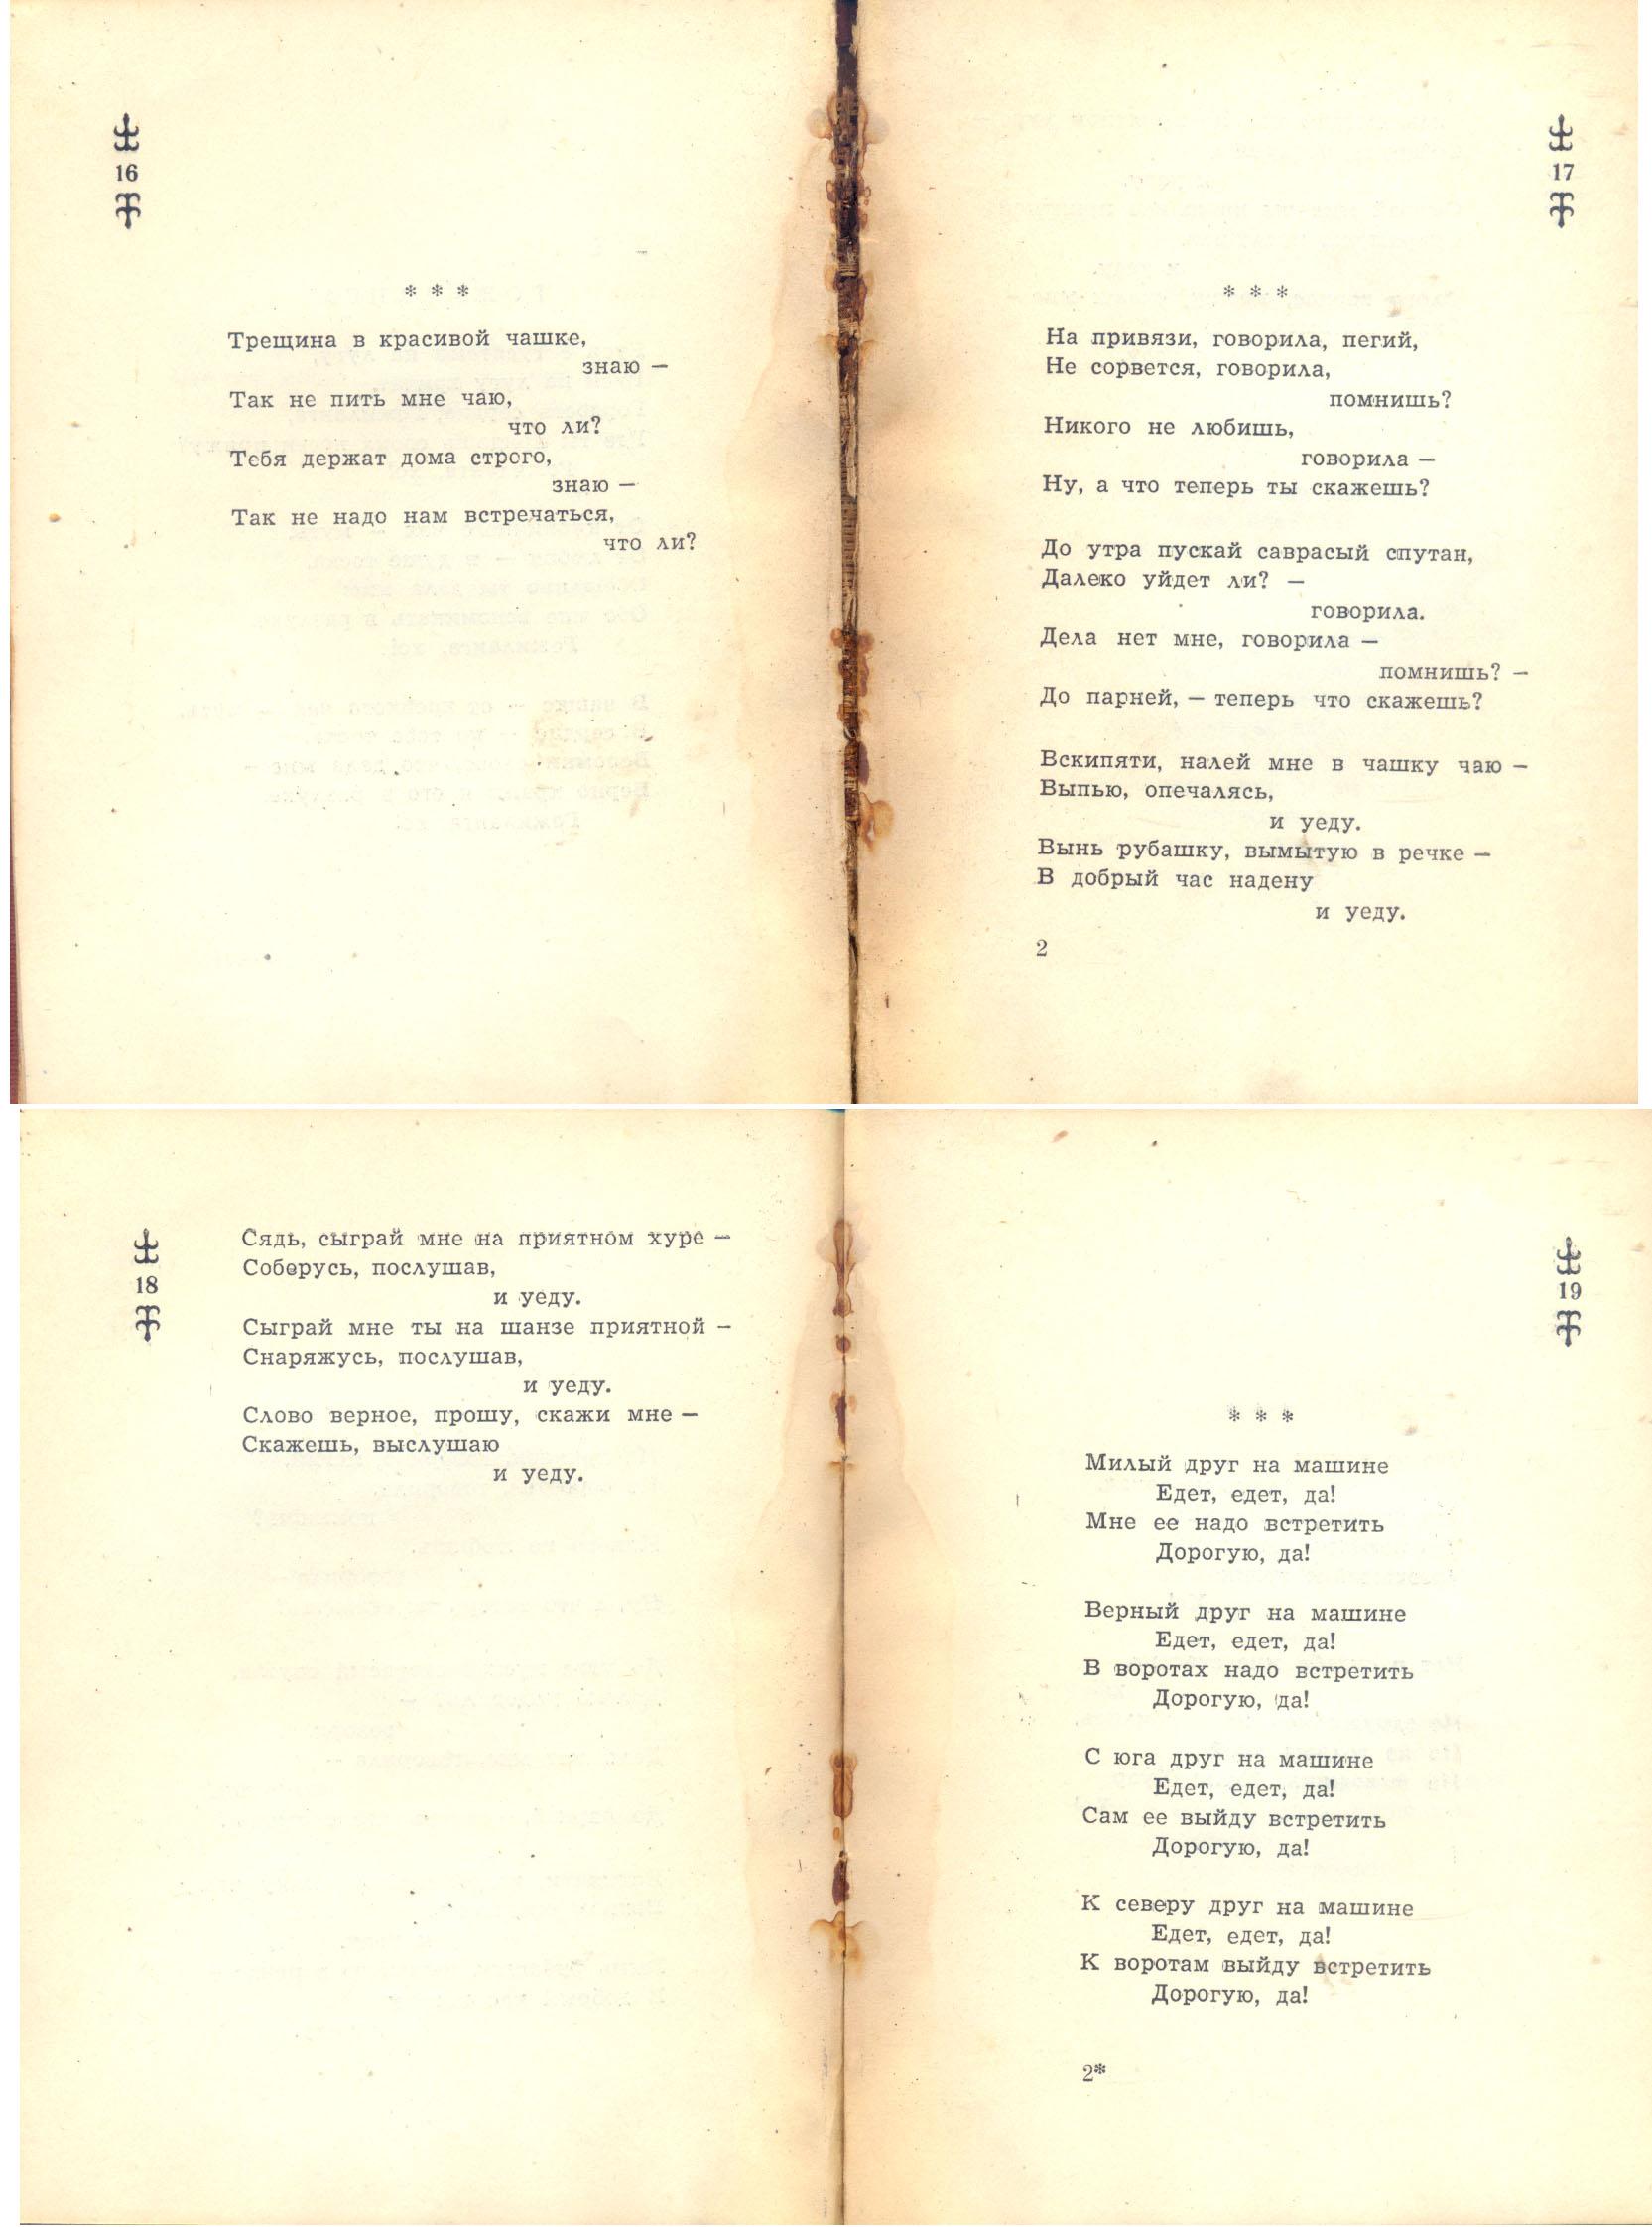 Песни 16-19.jpg